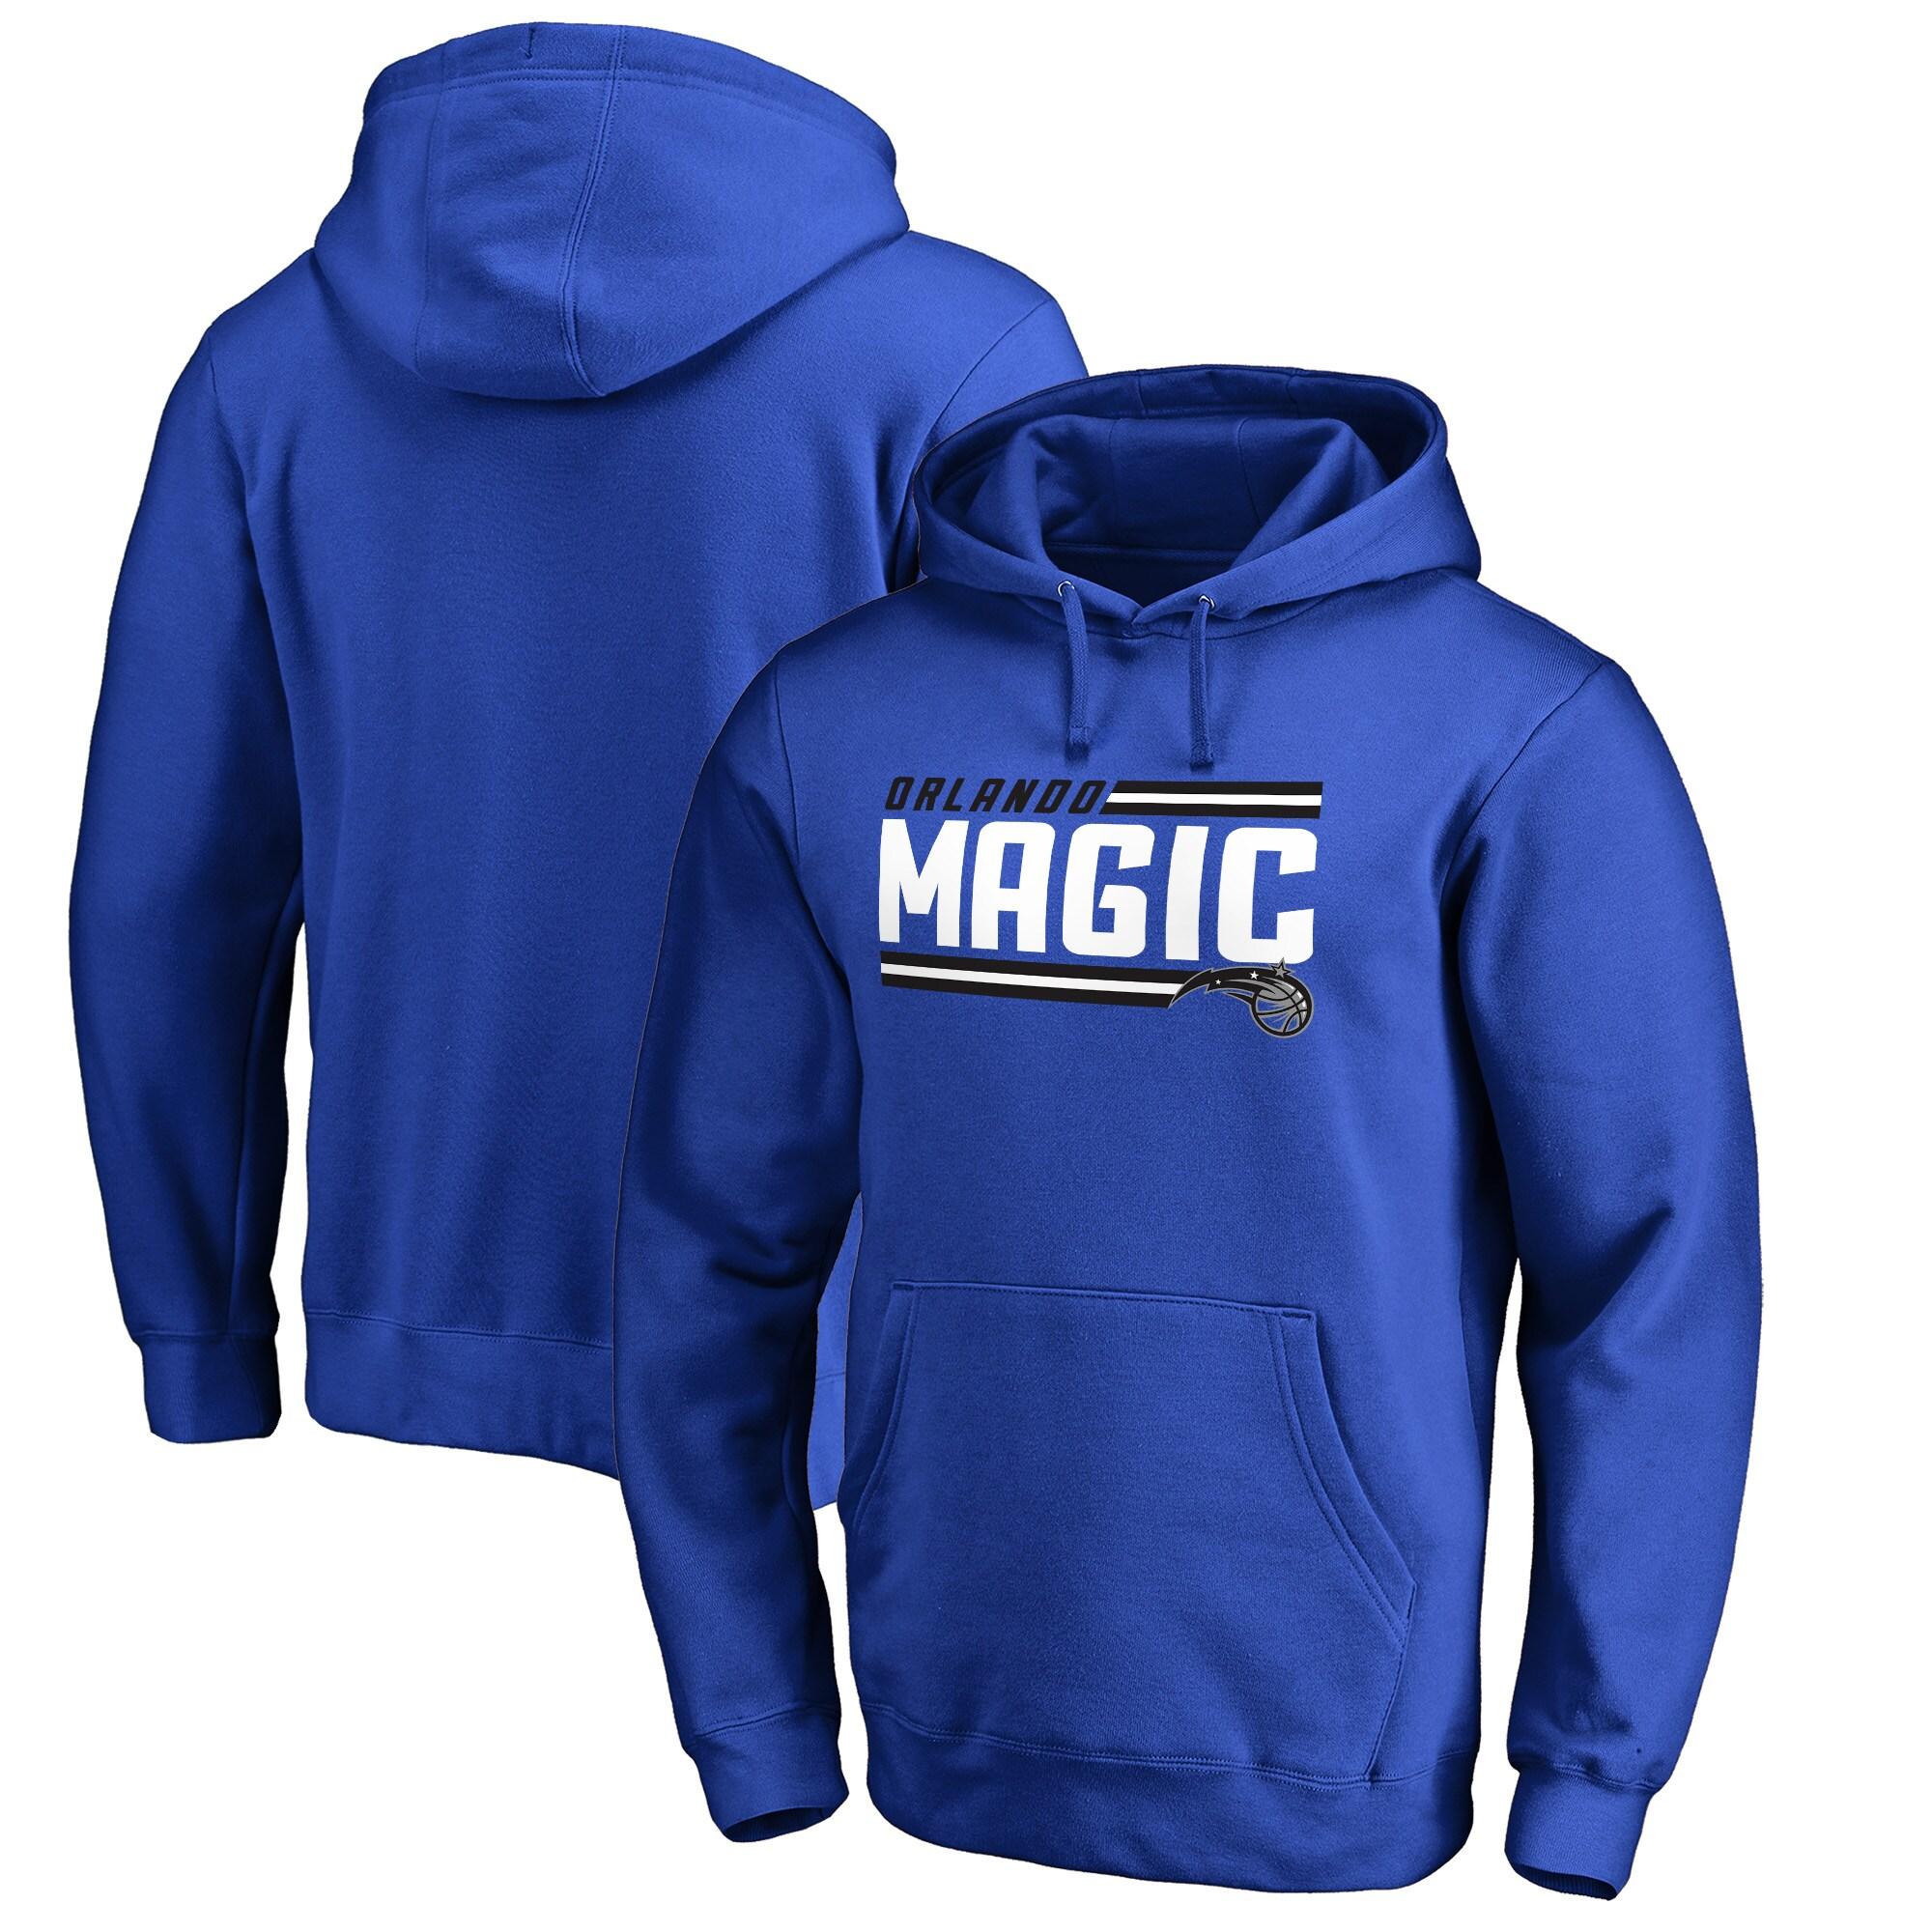 Orlando Magic Fanatics Branded Onside Stripe Big & Tall Pullover Hoodie - Royal